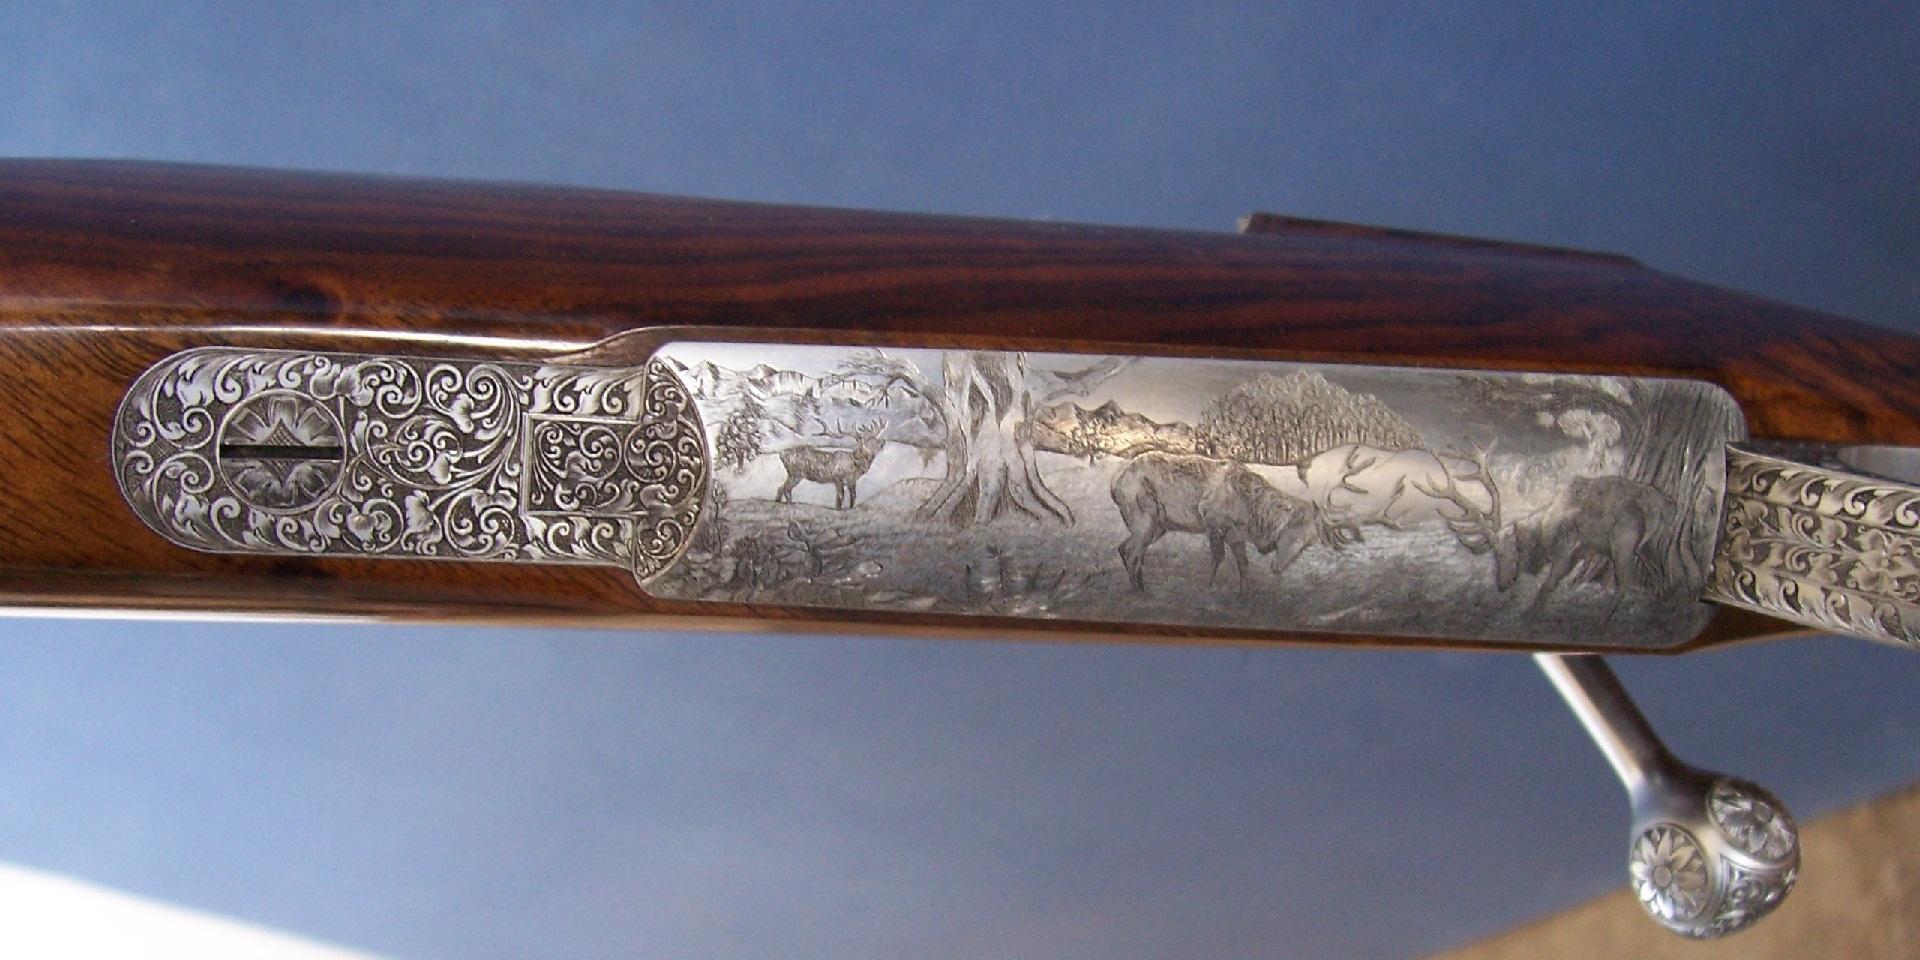 Roger Vardy Rifles & Stockwood